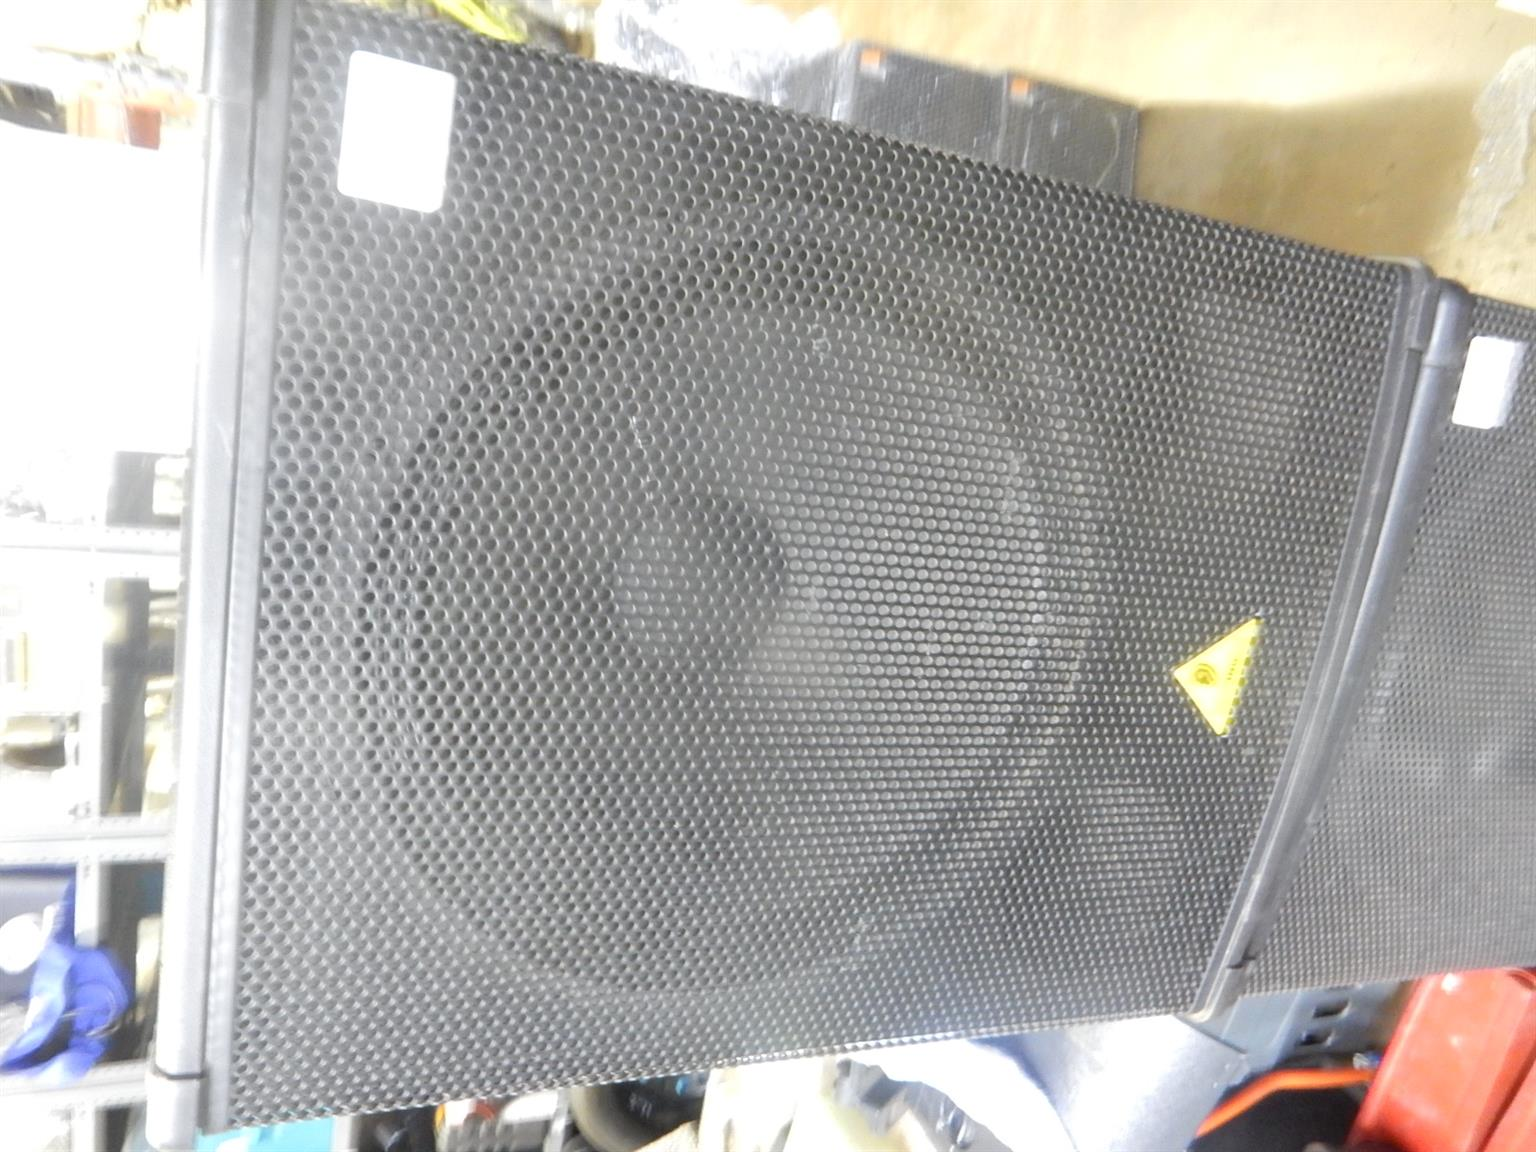 4 x Behringer Eurolive B1800X Pro Speakers